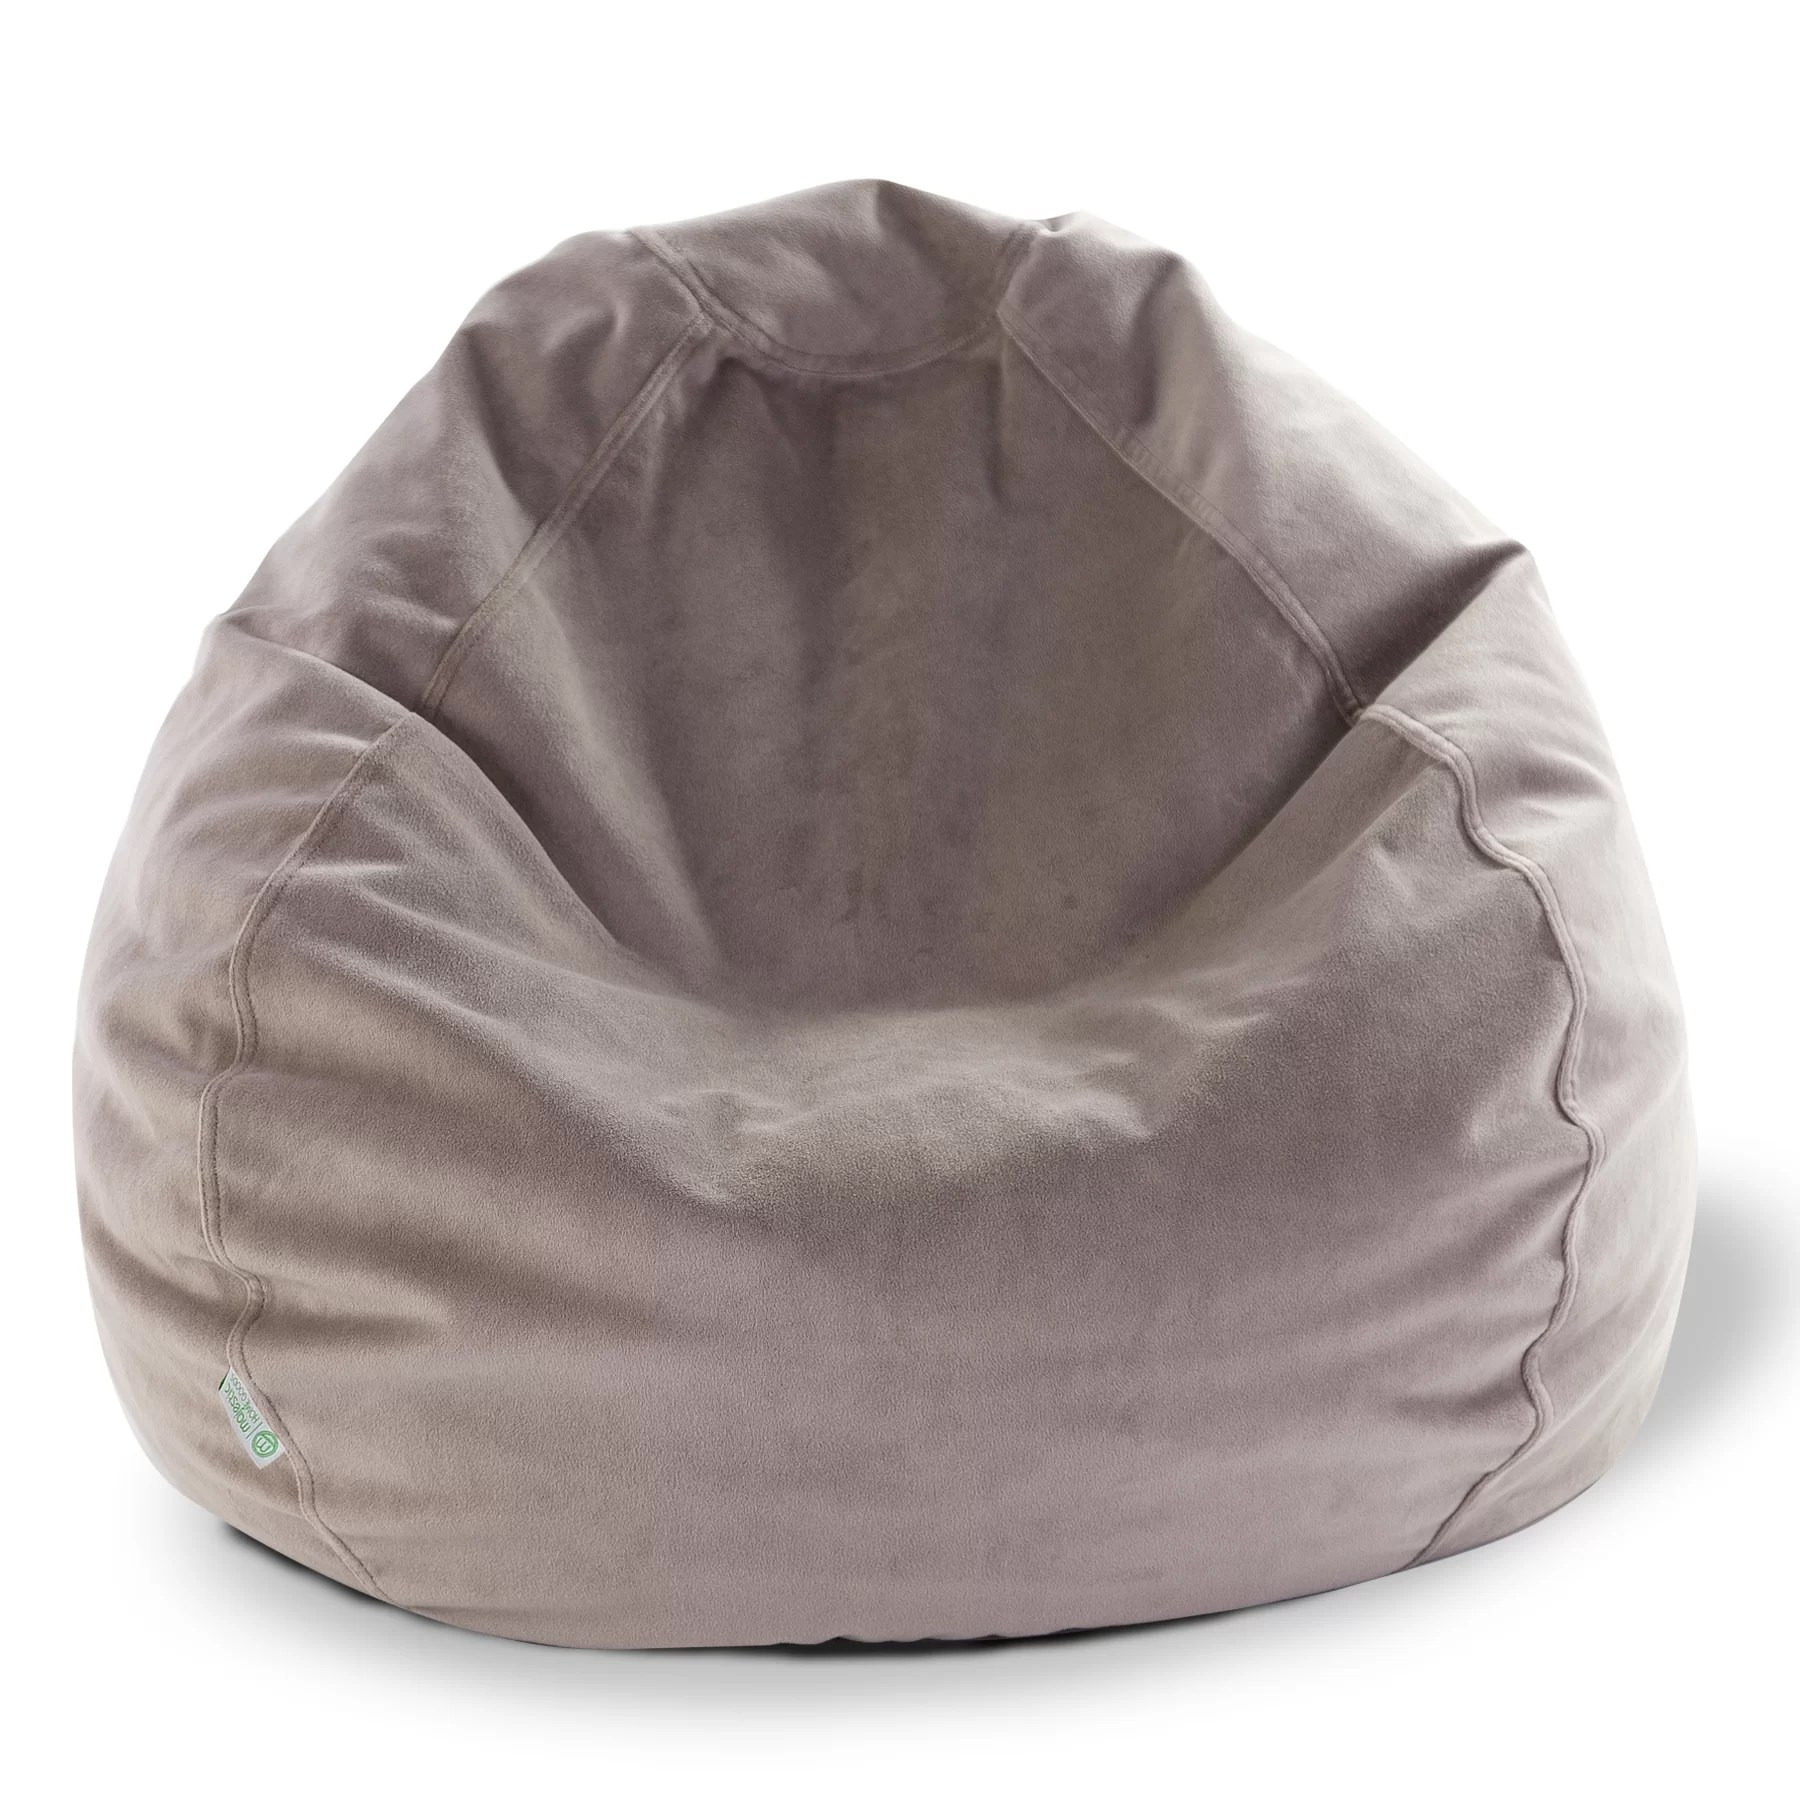 Majestic Home Goods Bean Bag Chair  Reviews  Wayfair